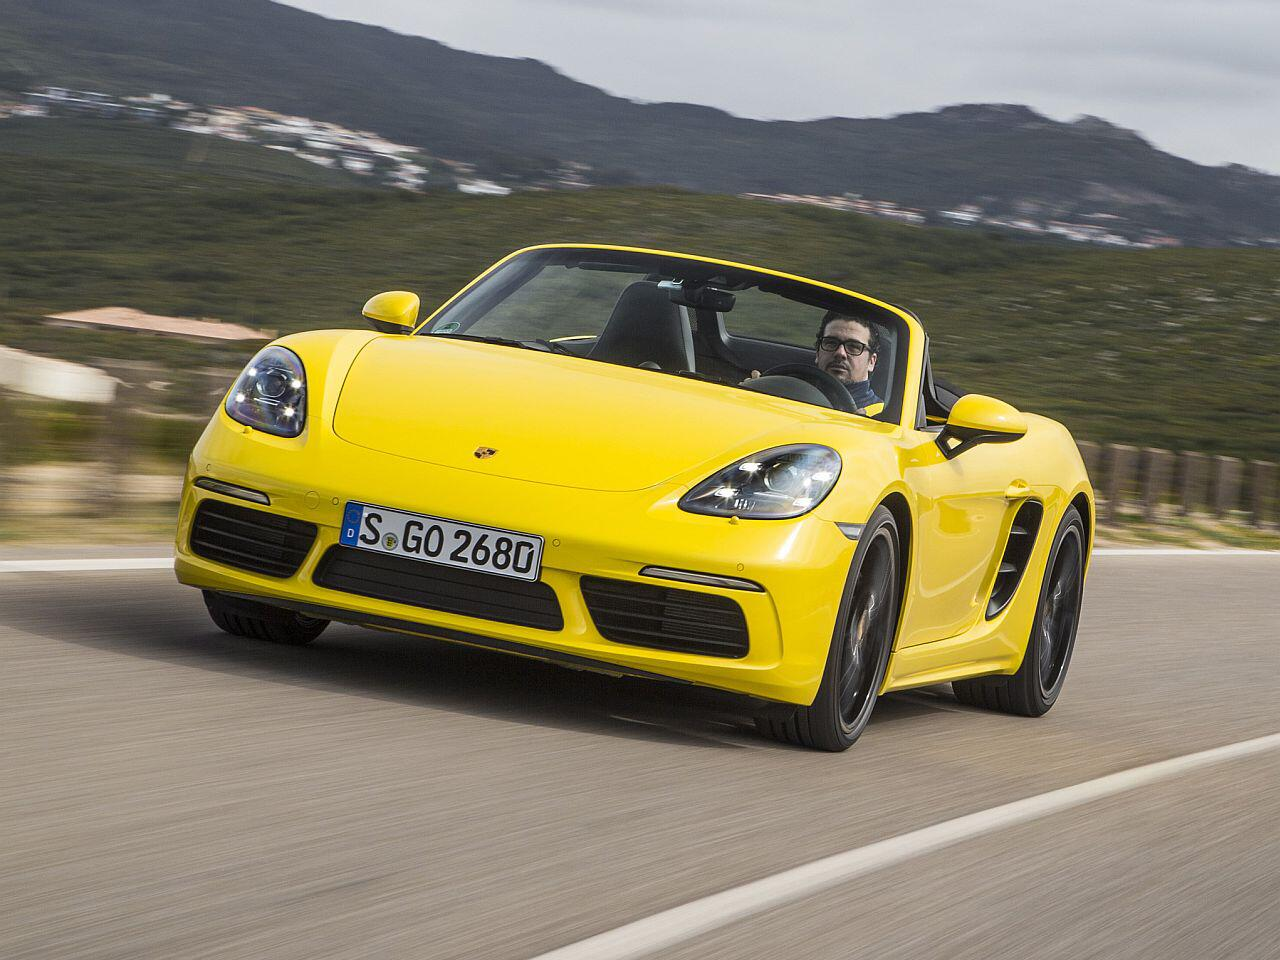 Bild zu Platz 5: Porscher Boxster